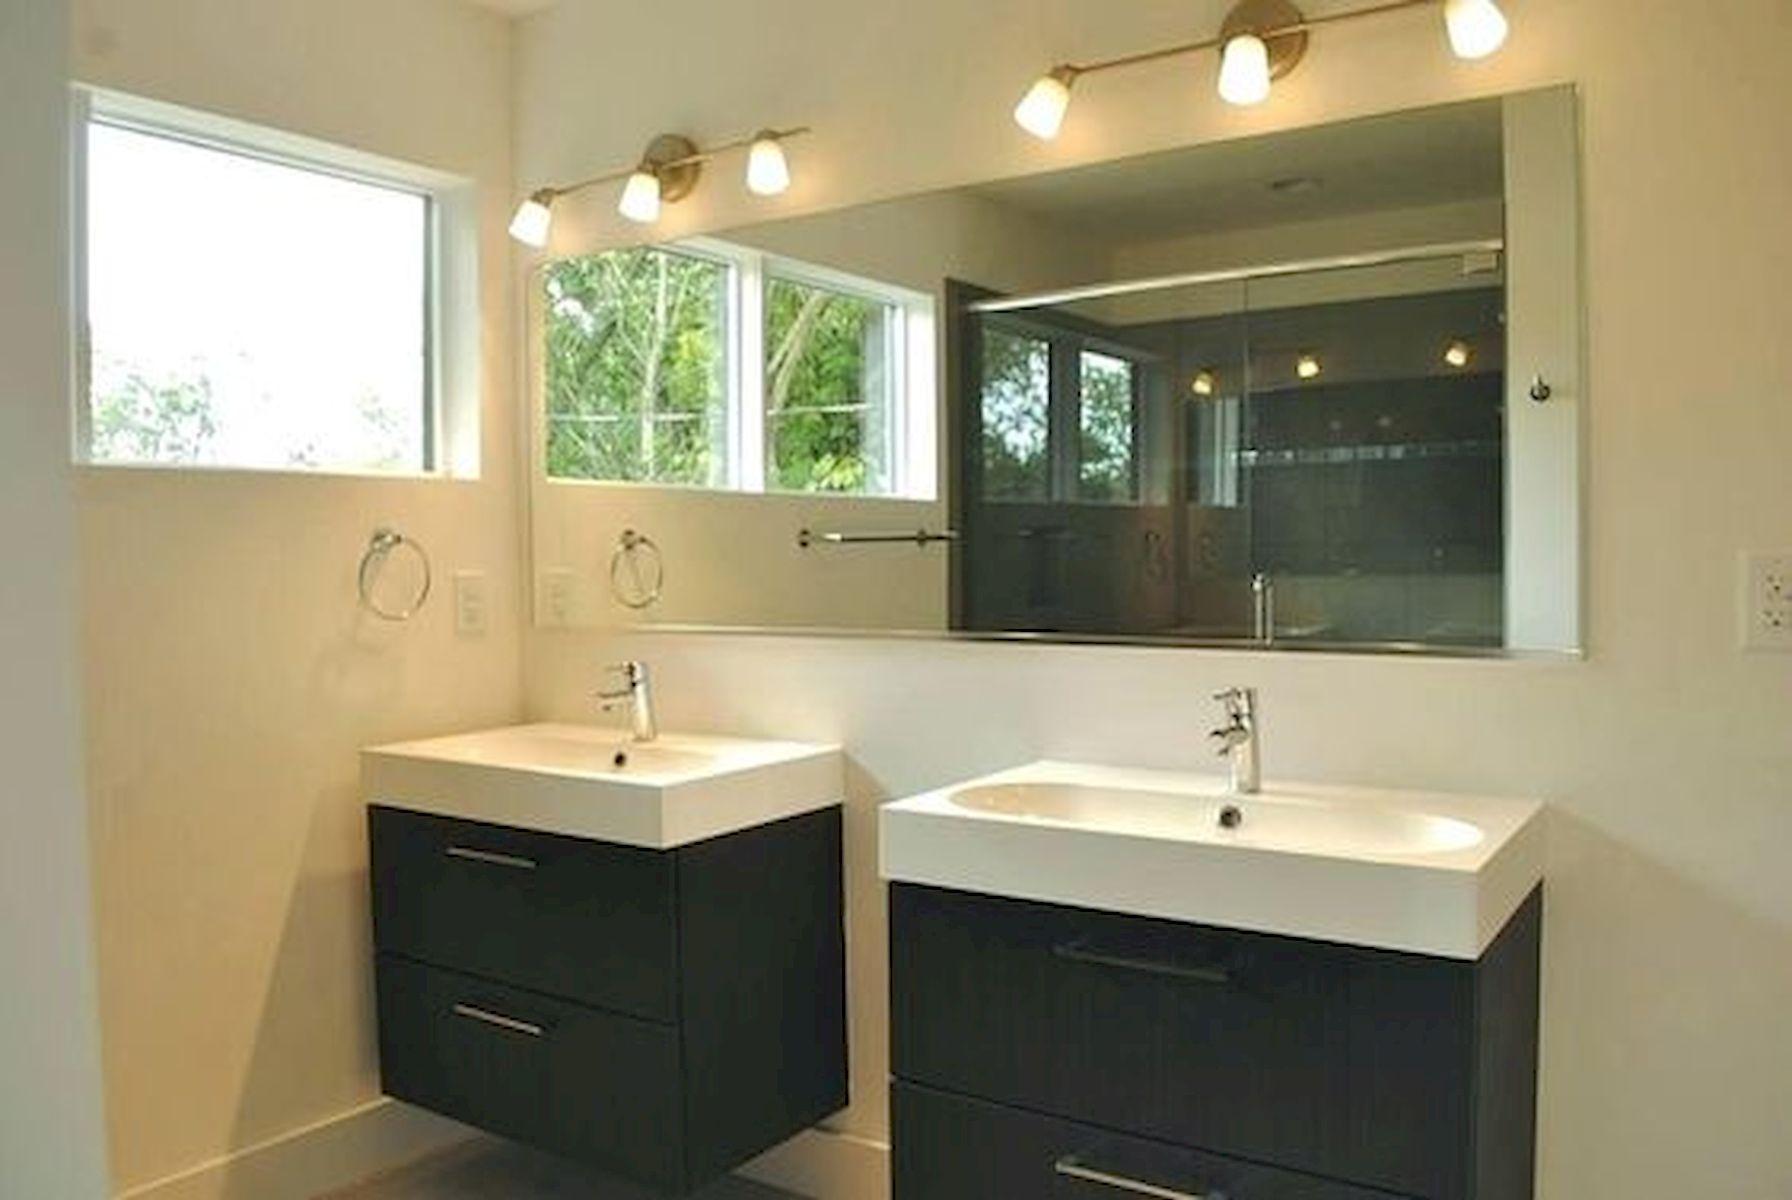 26 Easy and Creative DIY Mirror Ideas To Decorate Your Bathroom (7)